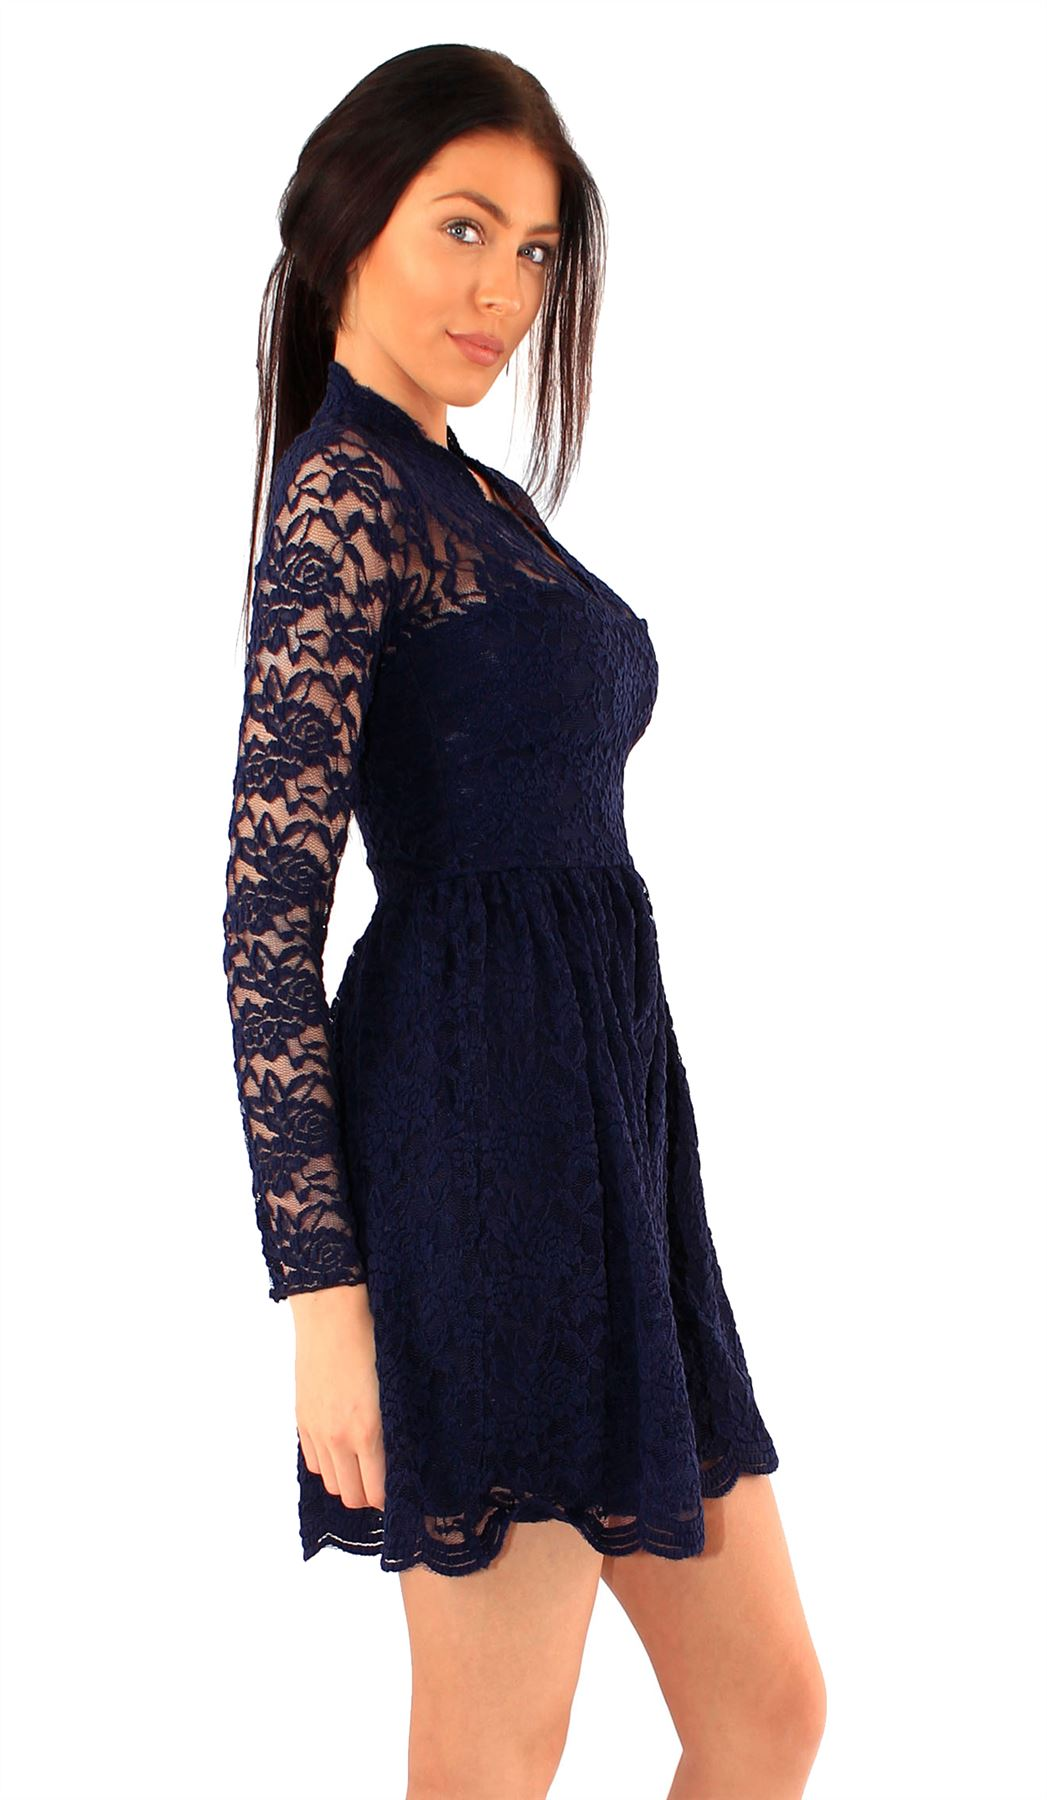 148b63fe8467 New Womens Long Sleeve Scallop Lace V-Front Skater Dress 8-22 | eBay